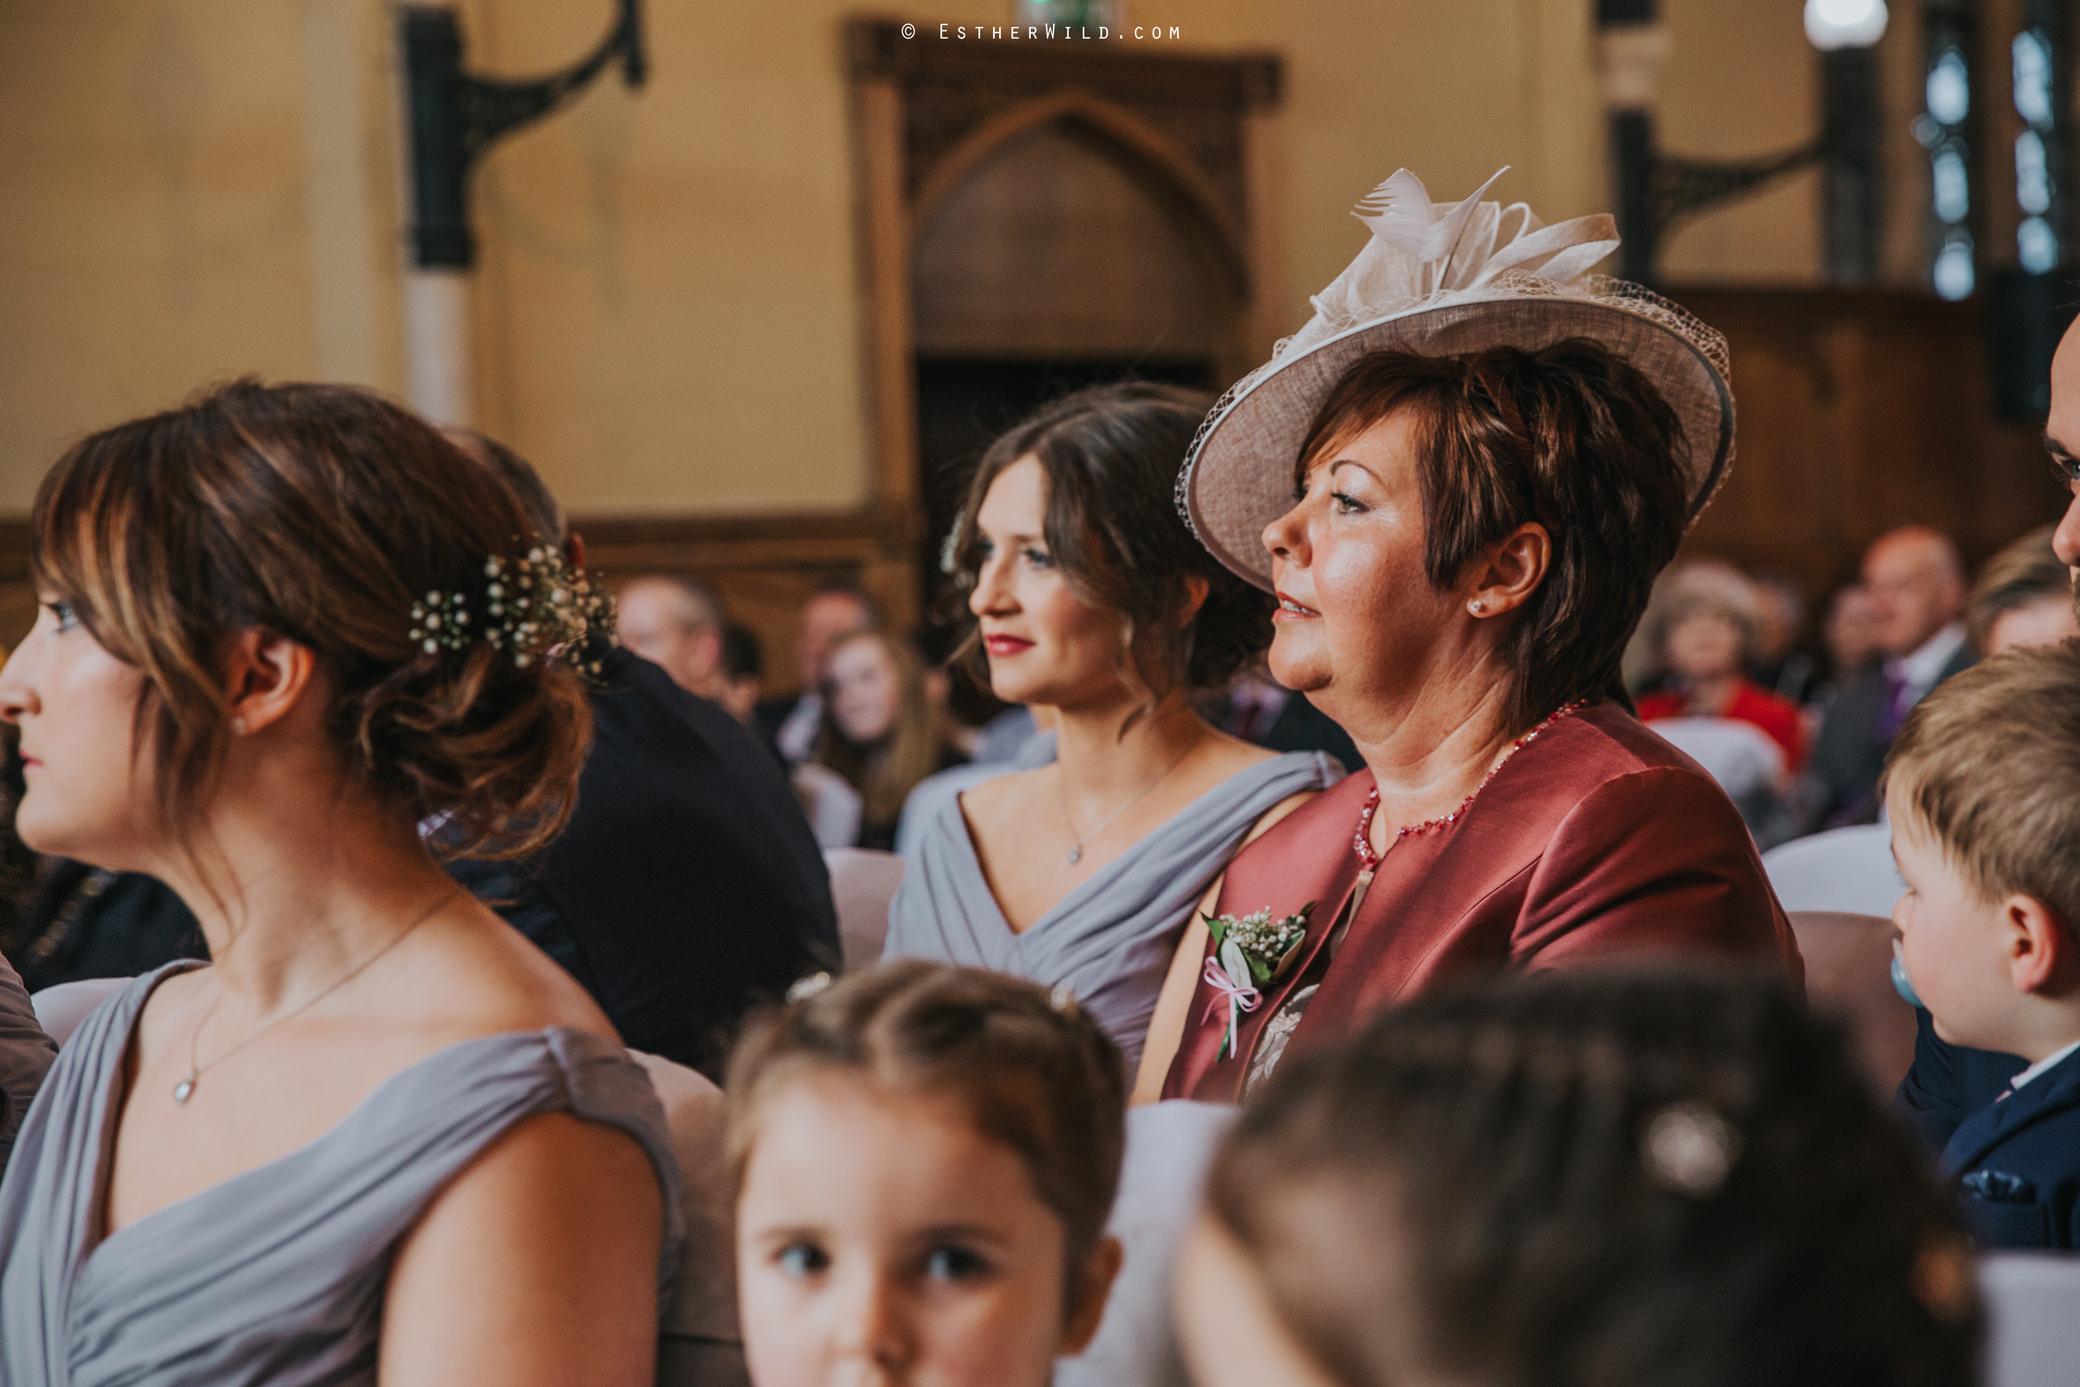 Wedding_Kings_Lynn_Town_Hall_Norfolk_Photographer_Esther_Wild_IMG_1072.jpg